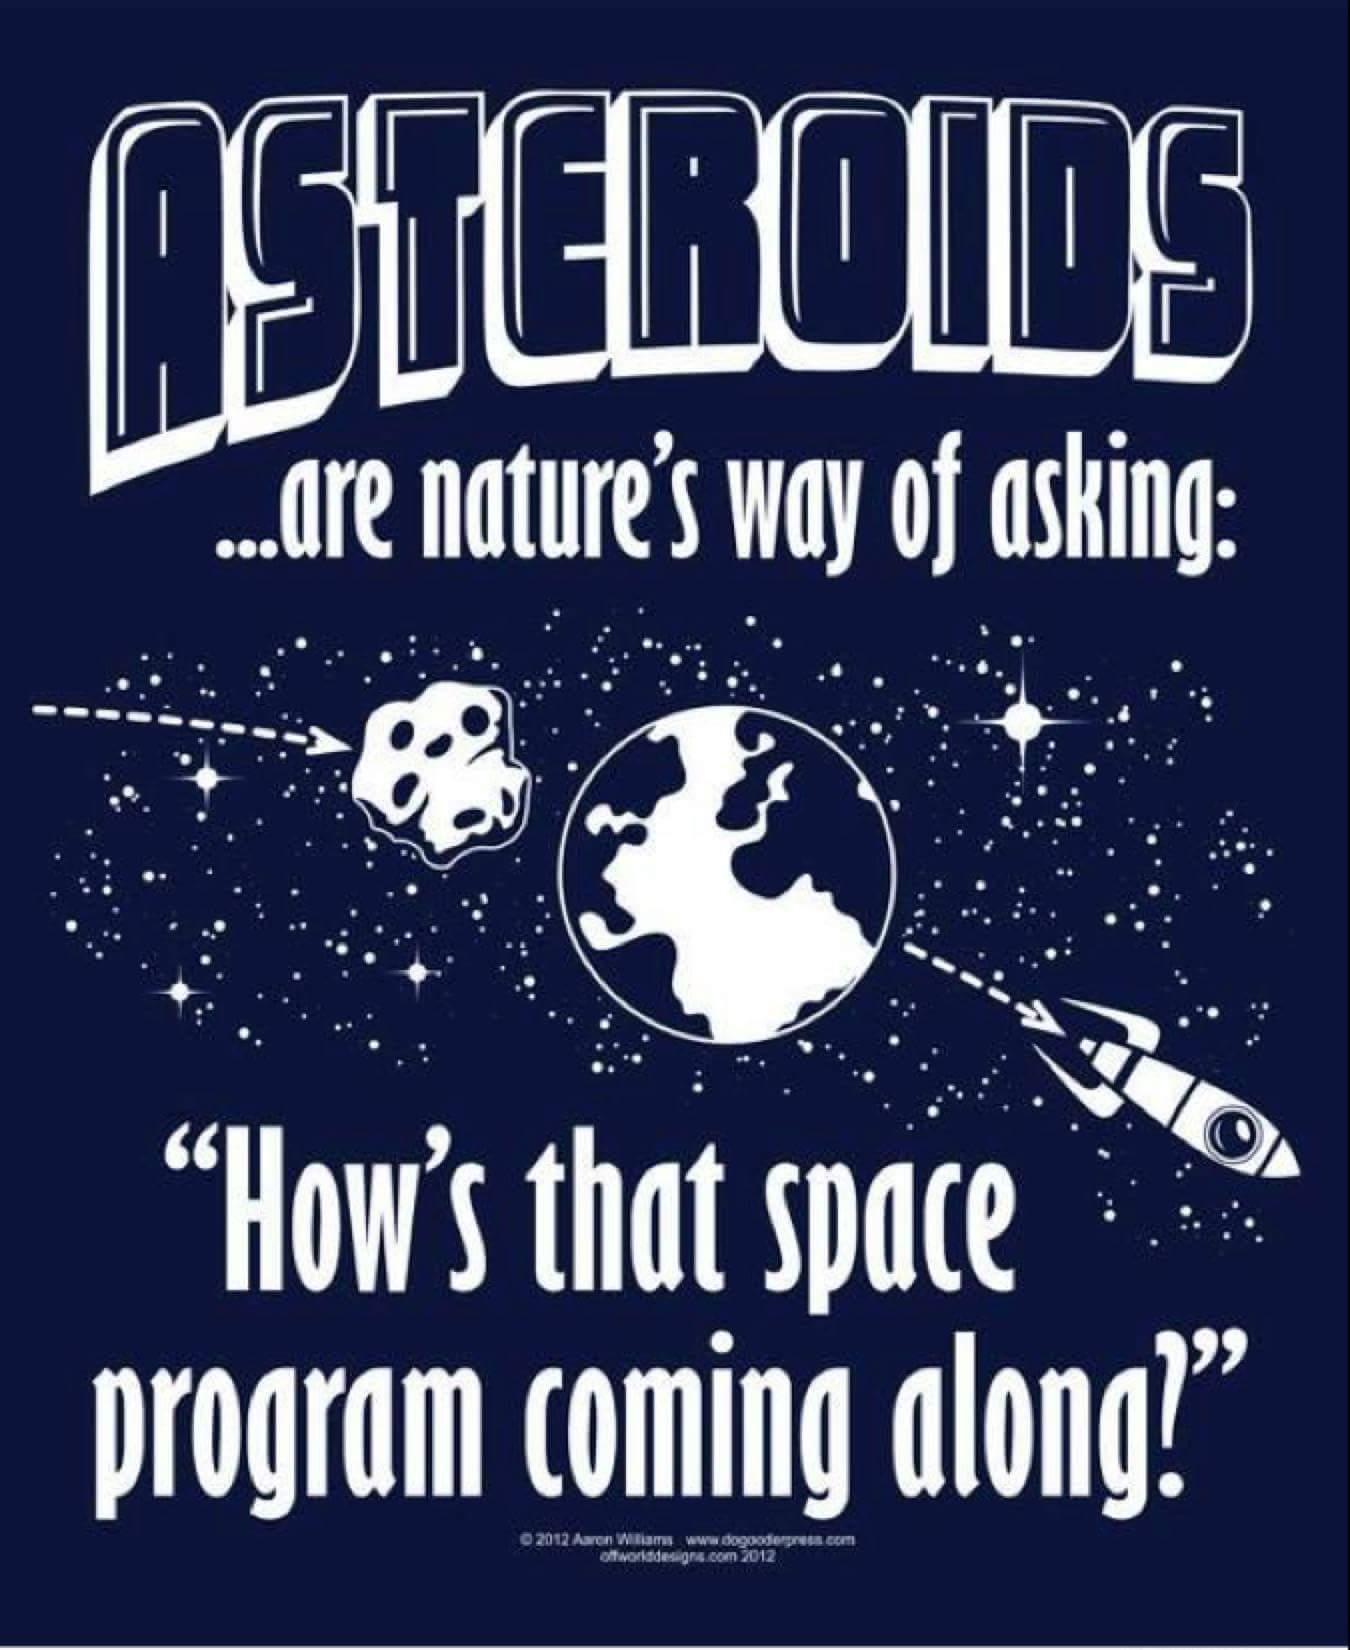 Planetary - meme